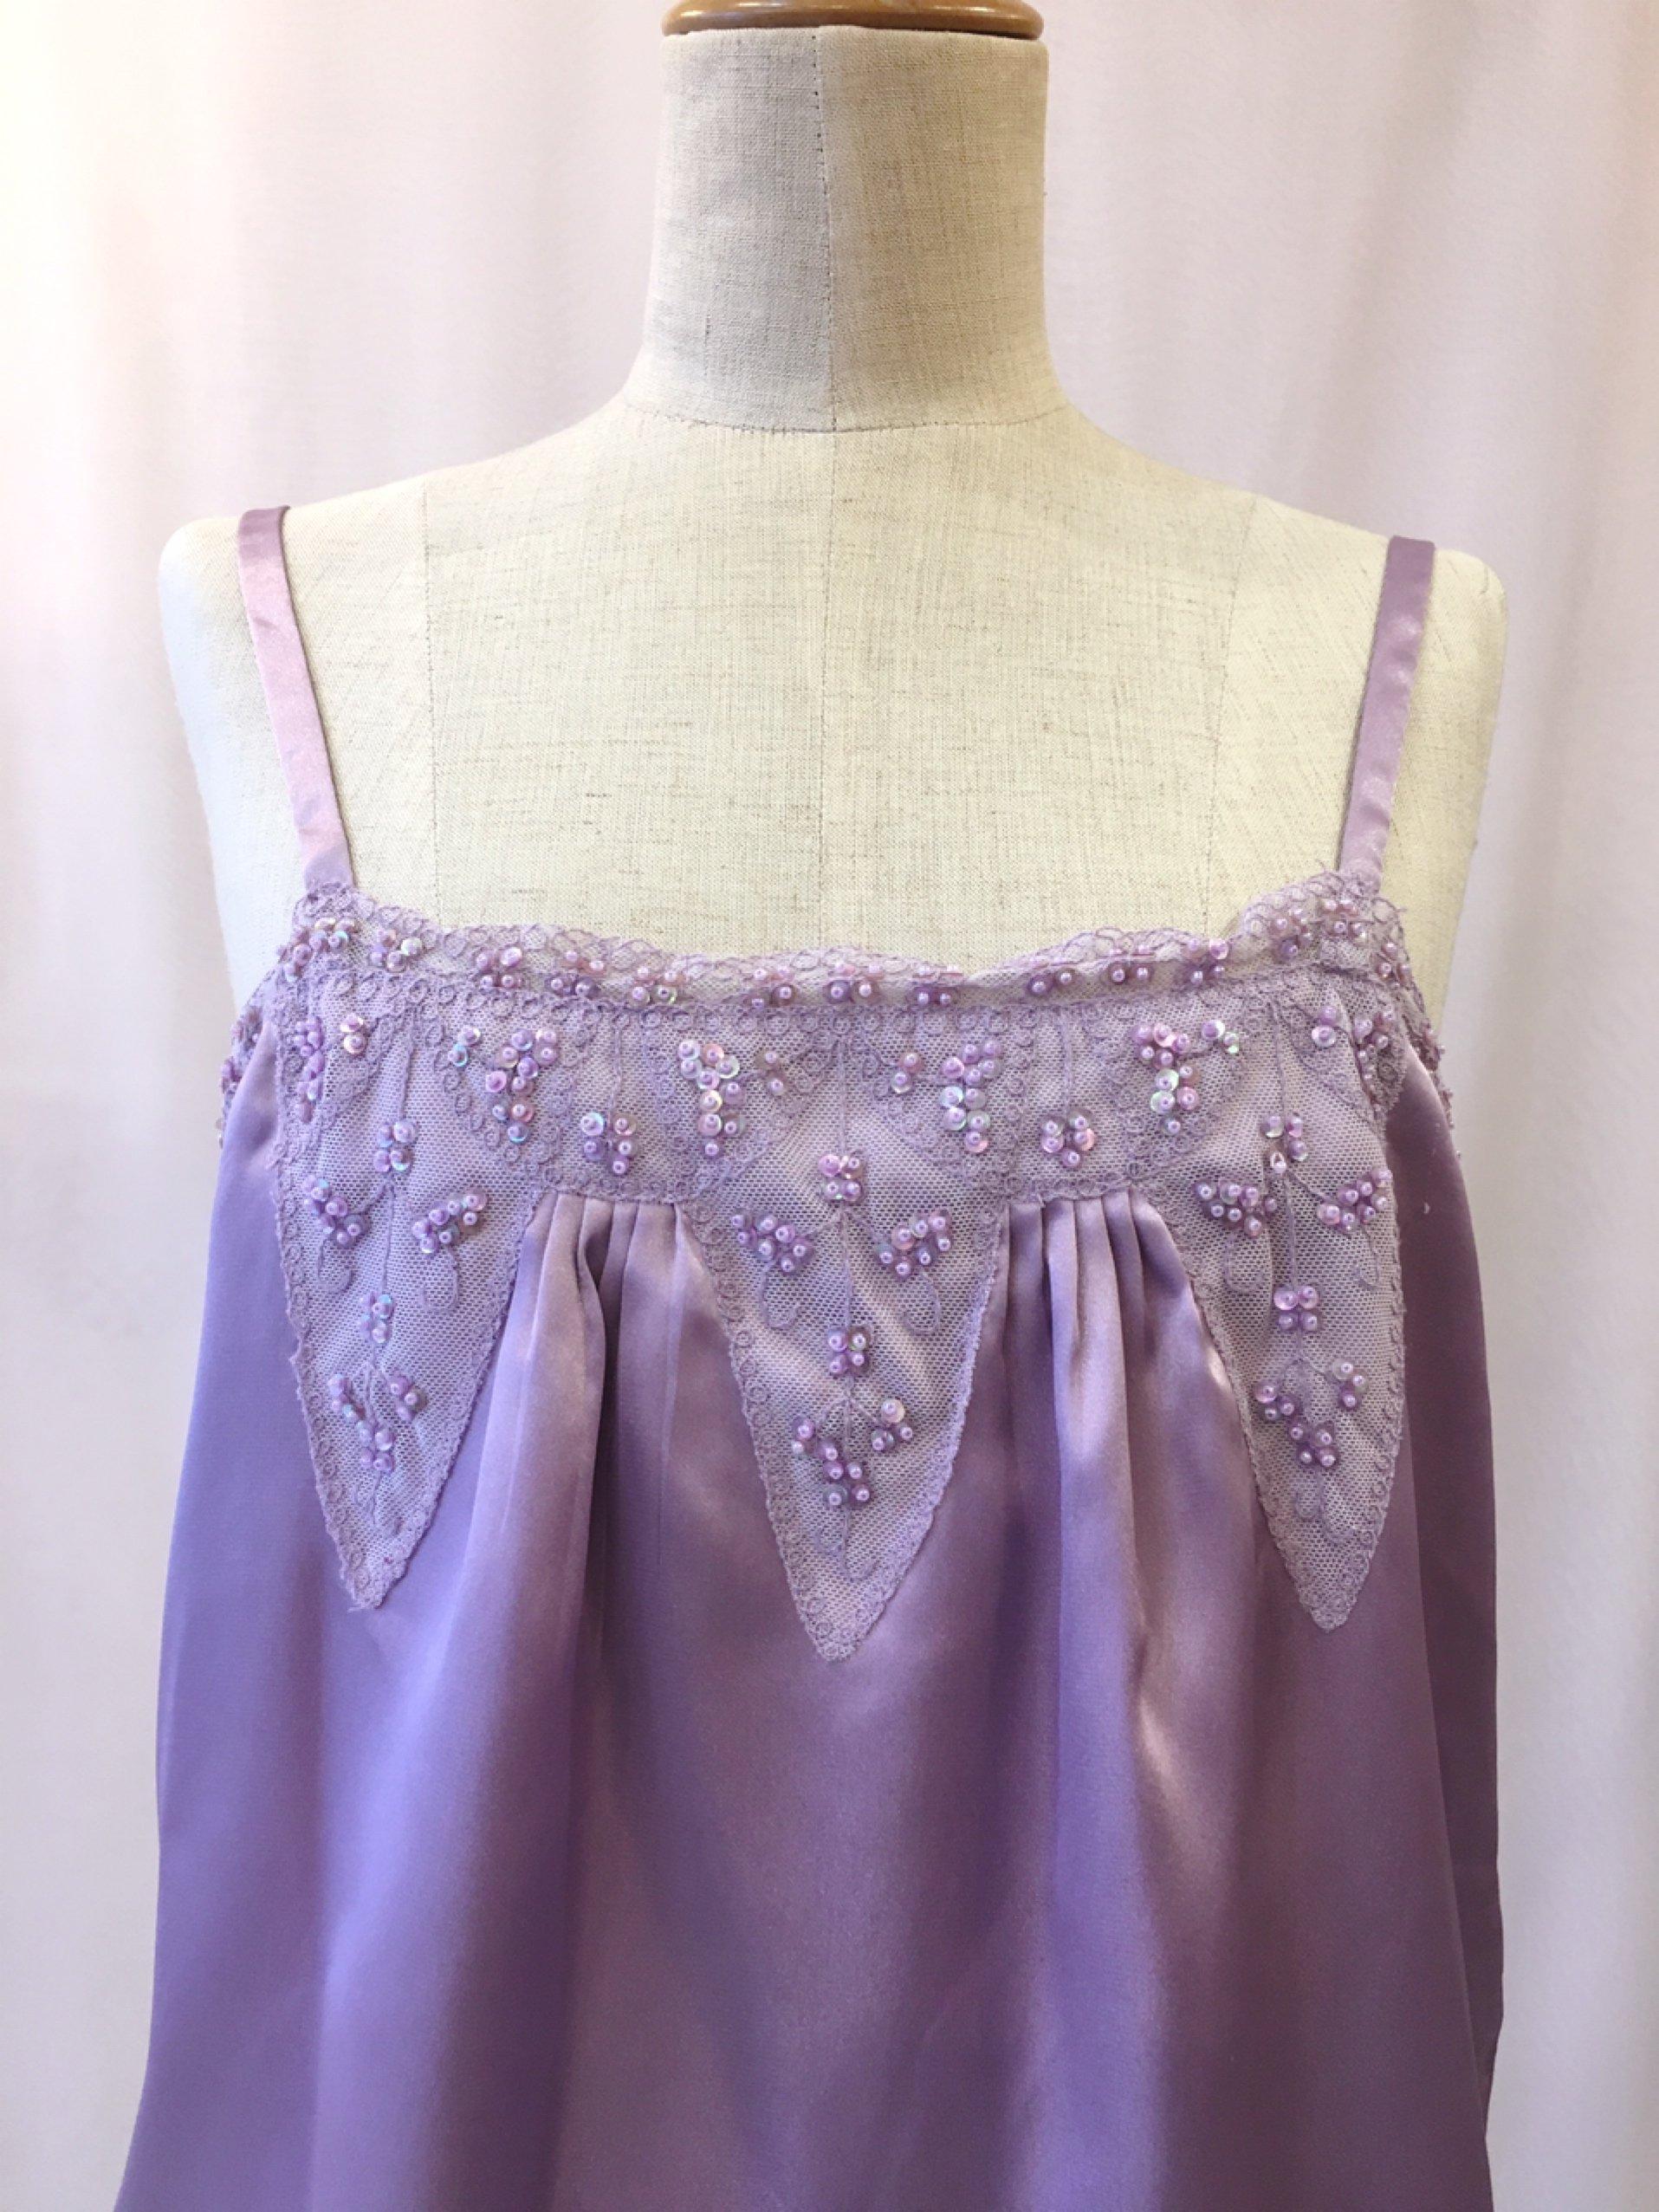 lavender lingerie camisole